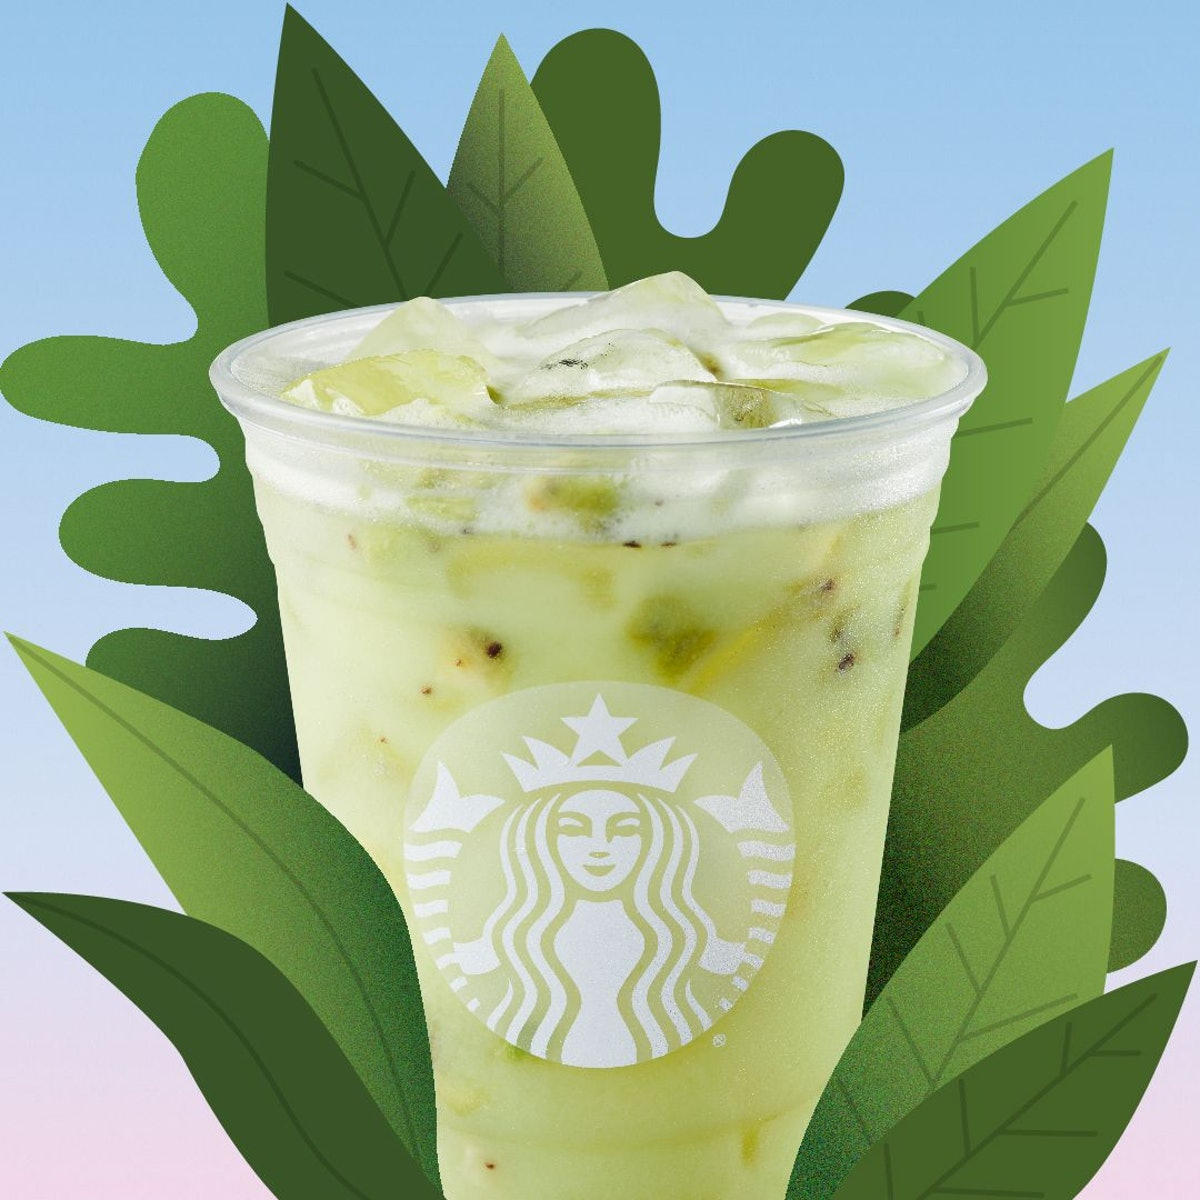 Starbucks' new Star Drink adds coconut milk to its Kiwi Starfruit Refresher.